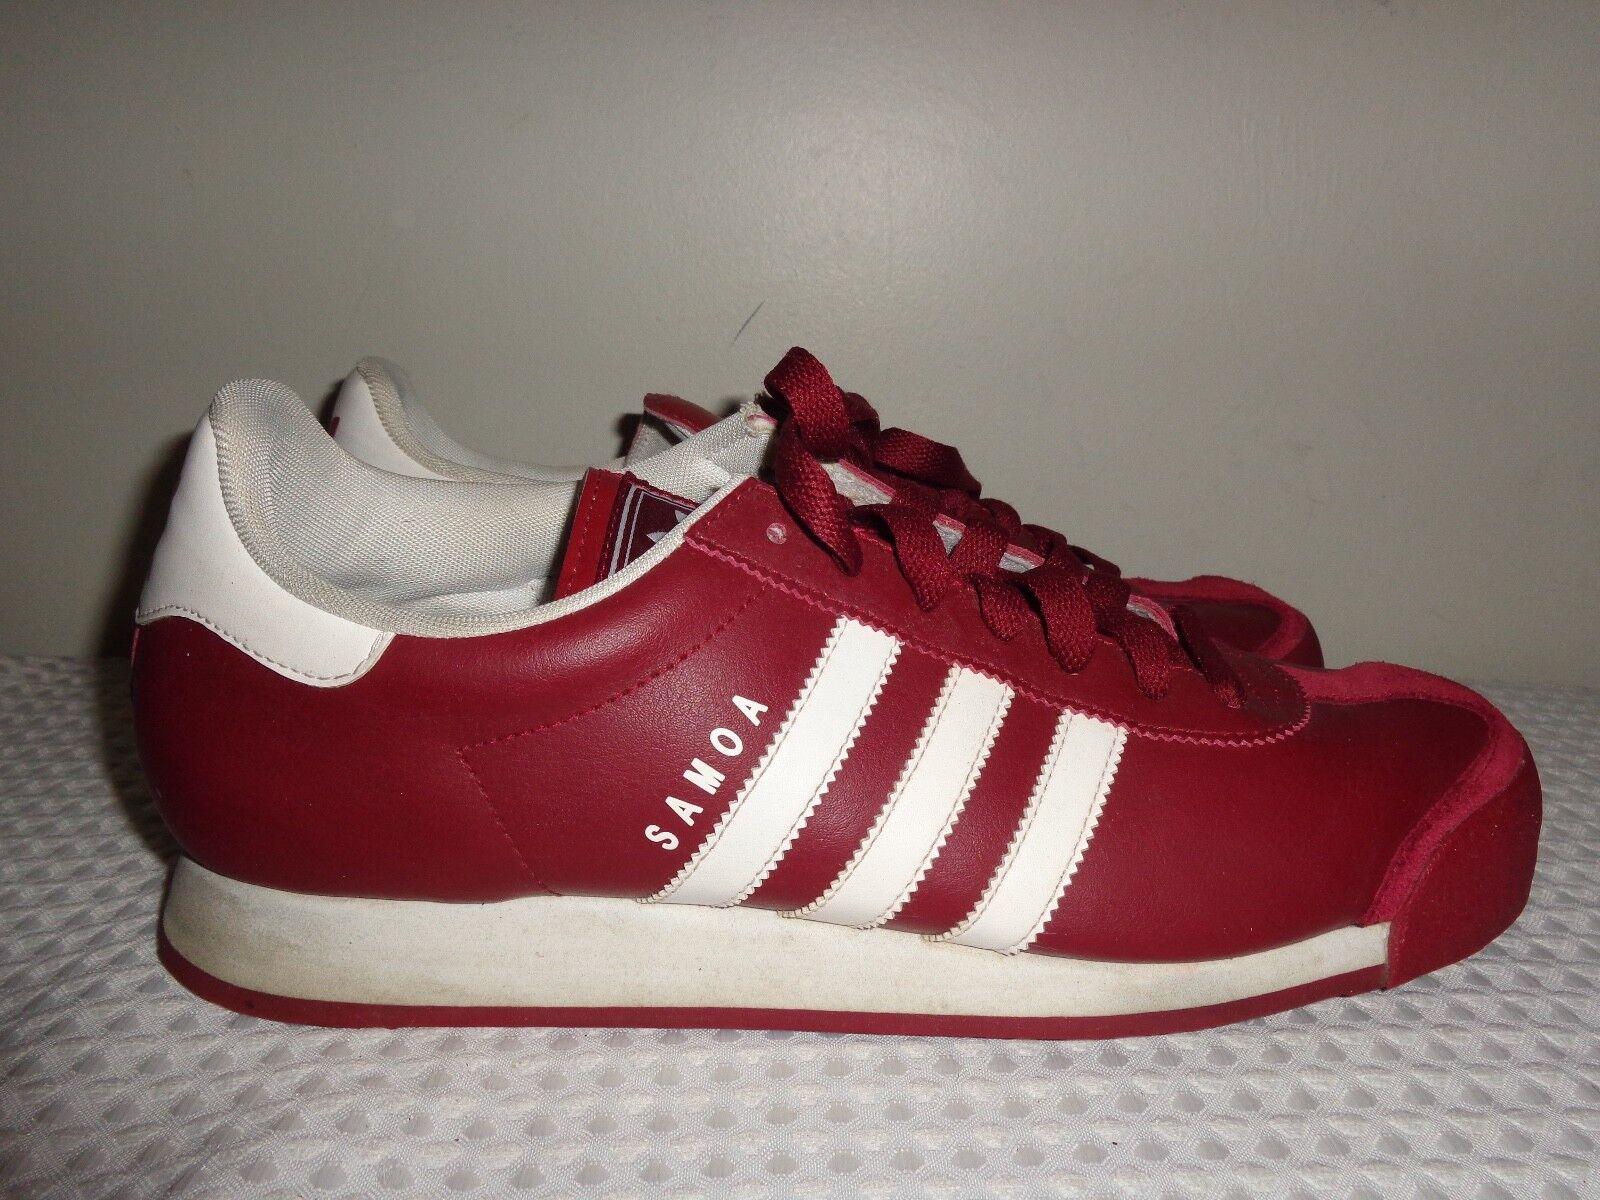 Adidas Samoa Original Maroon & White Sneakers  shoes Size 11